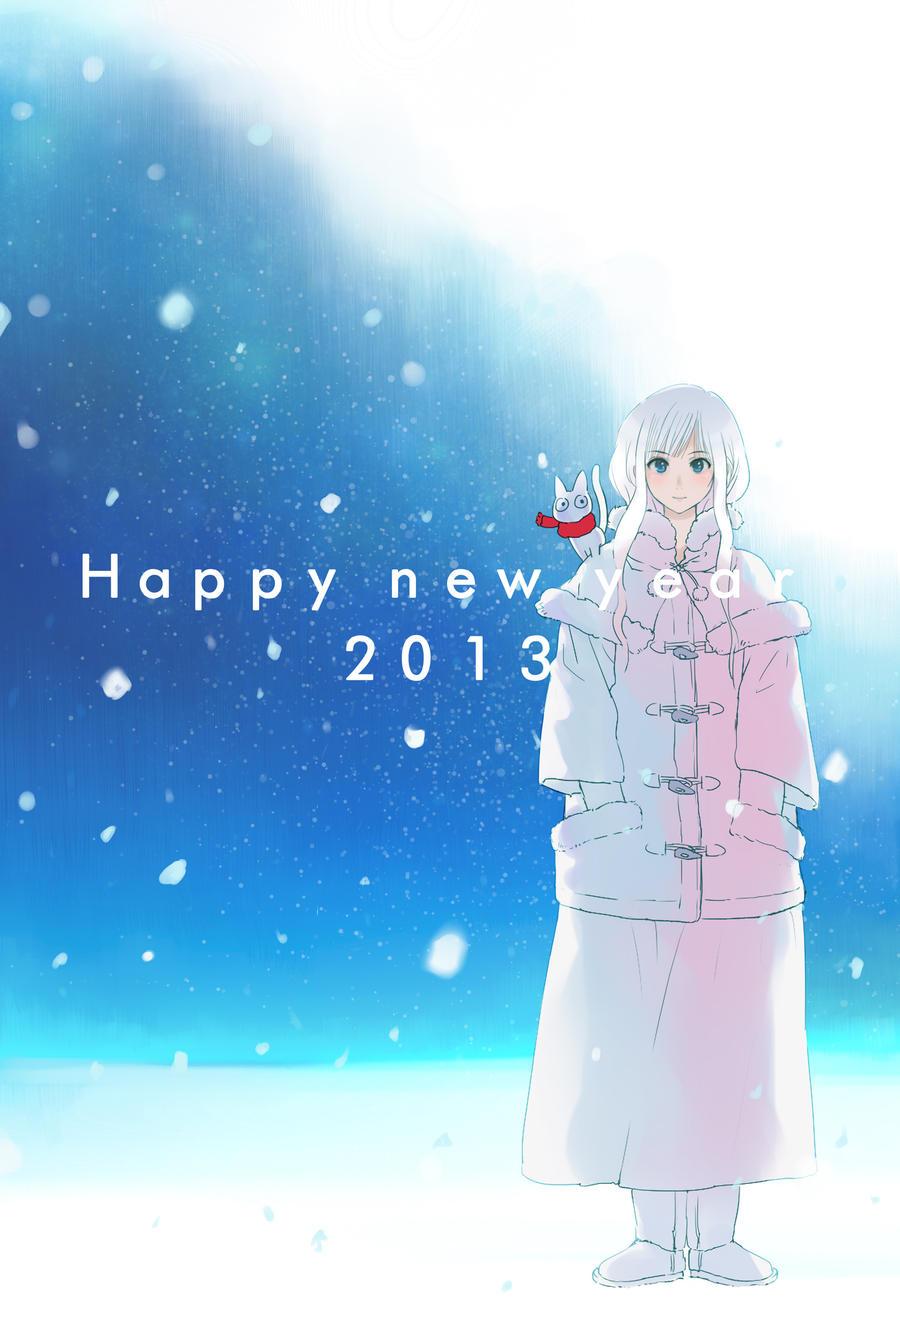 Happy new year! by dackQ